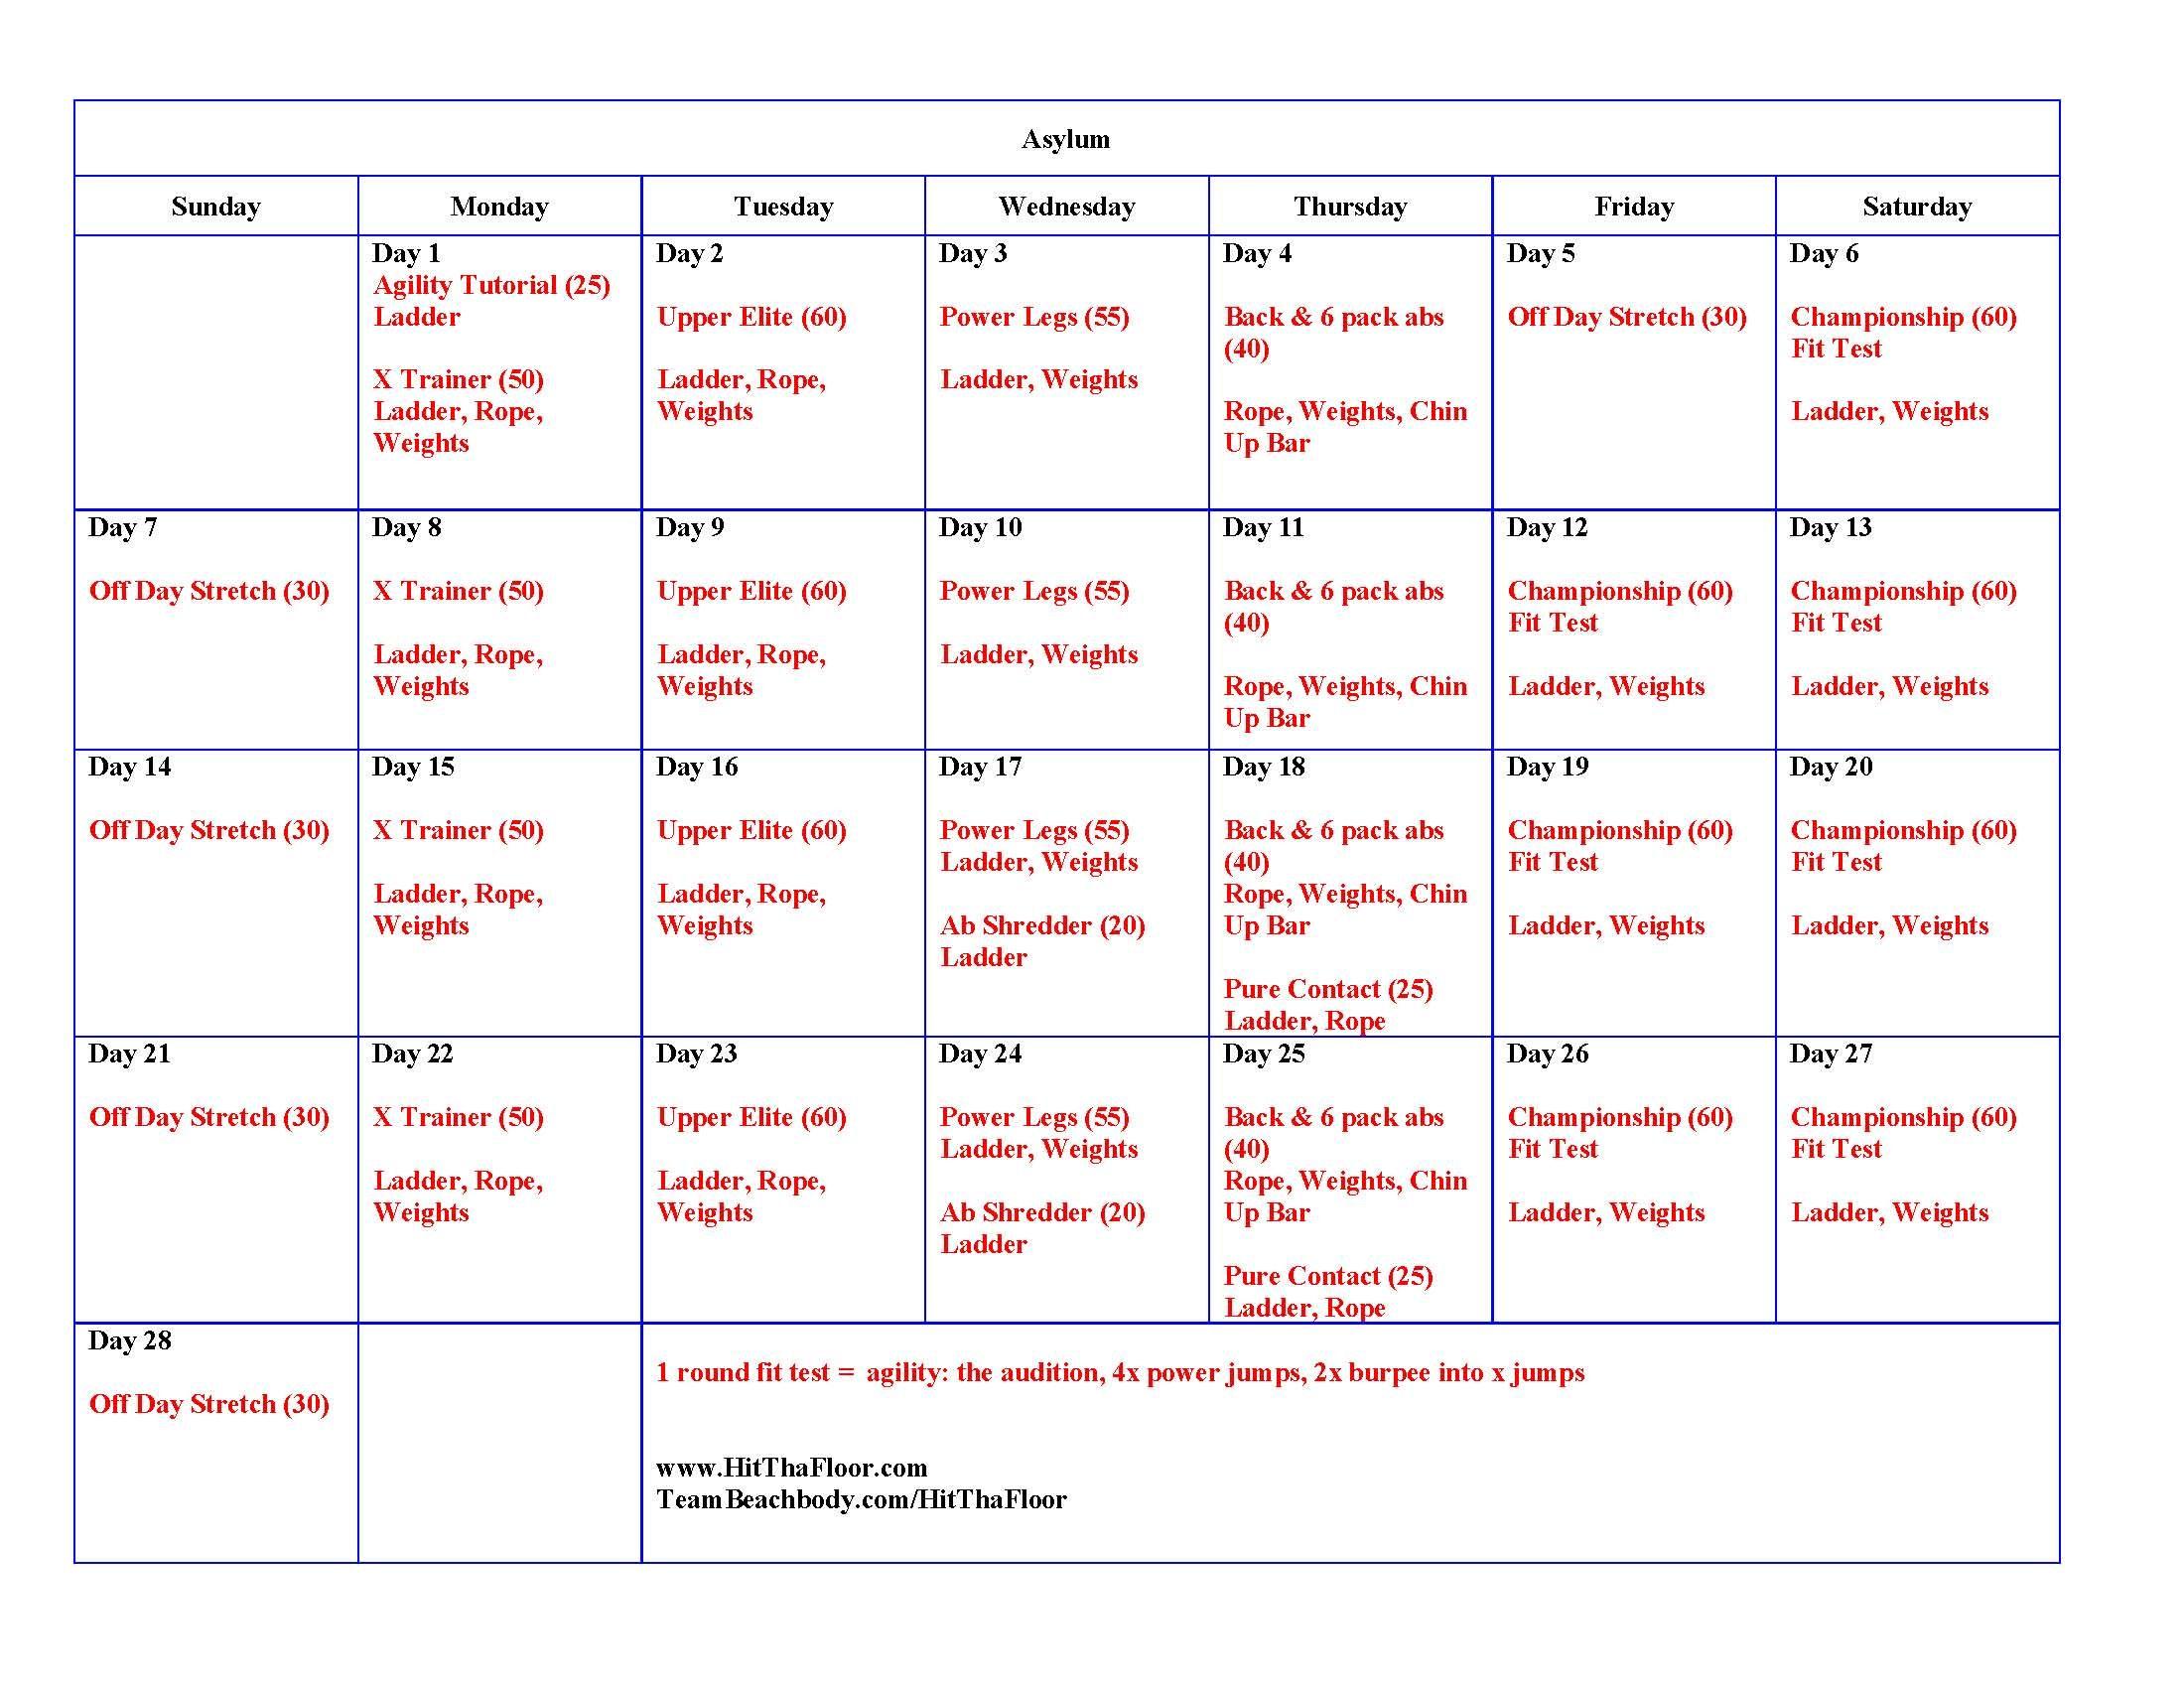 Calendario Fit.Asylum Volume 2 Calendar Workout Workout Ab Day Fitness